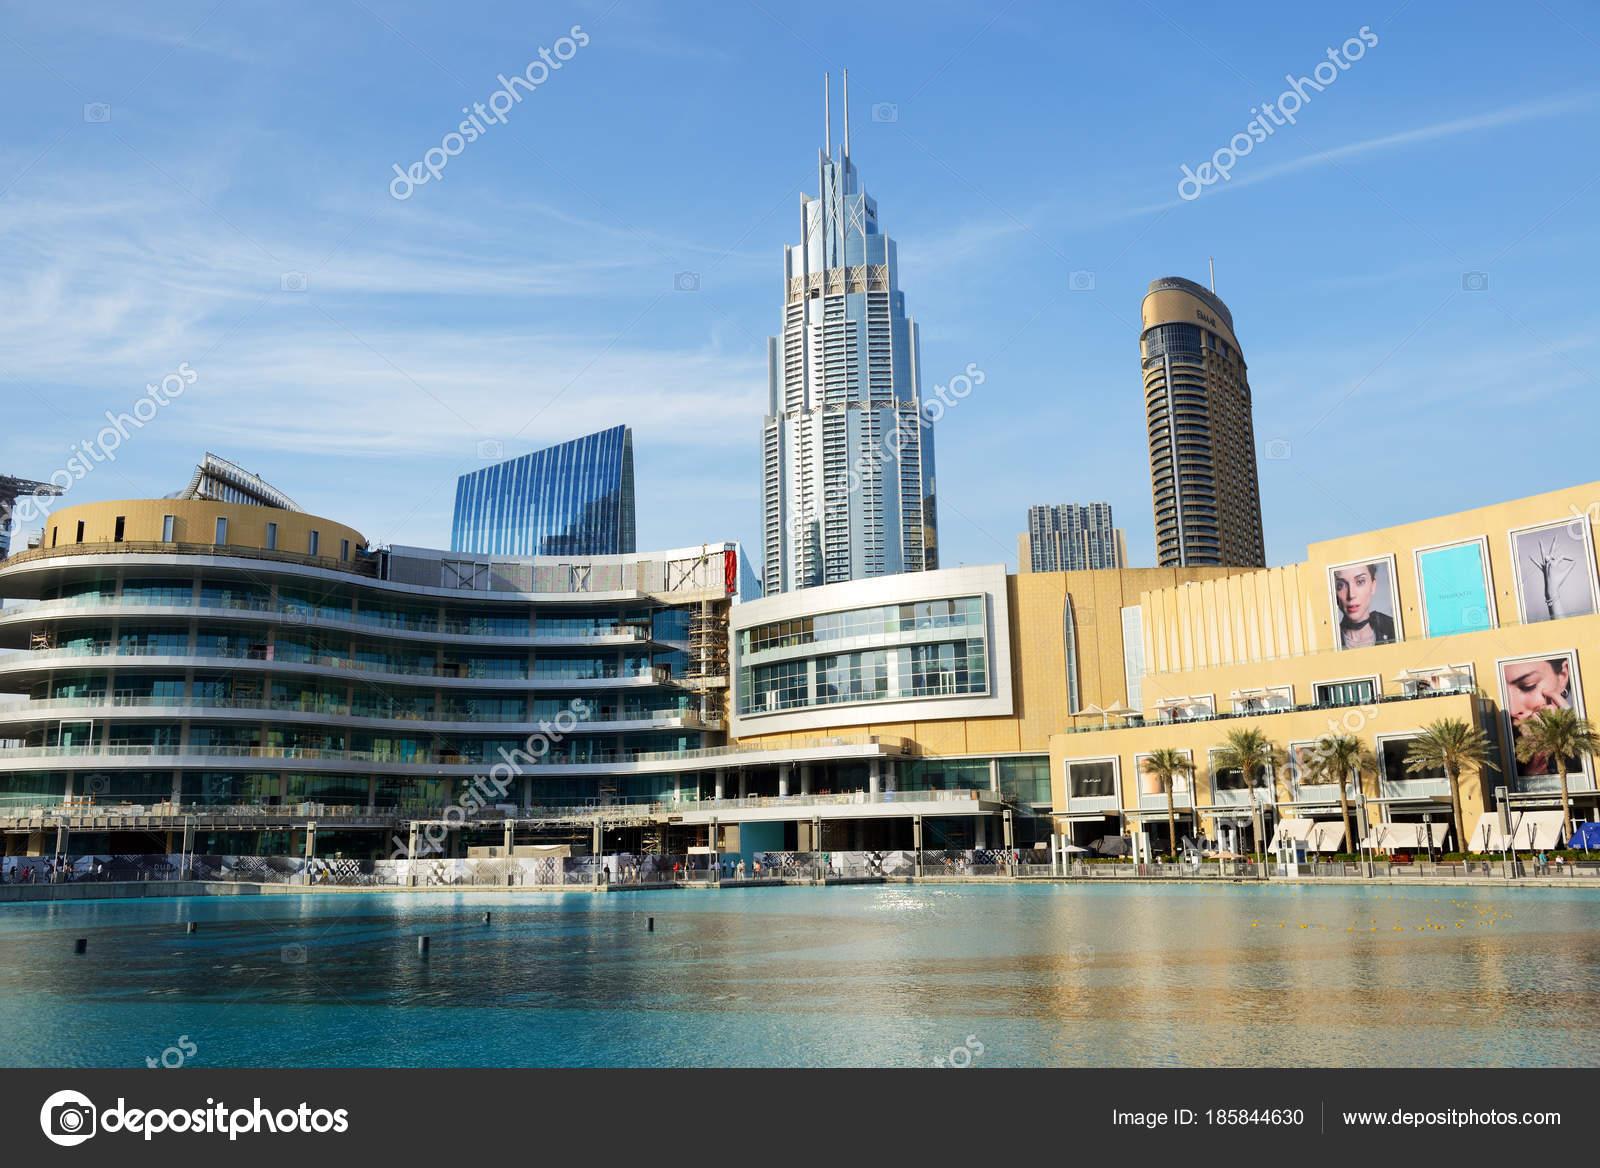 Pictures : burj khalifa inside | DUBAI, UAE - NOVEMBER 19